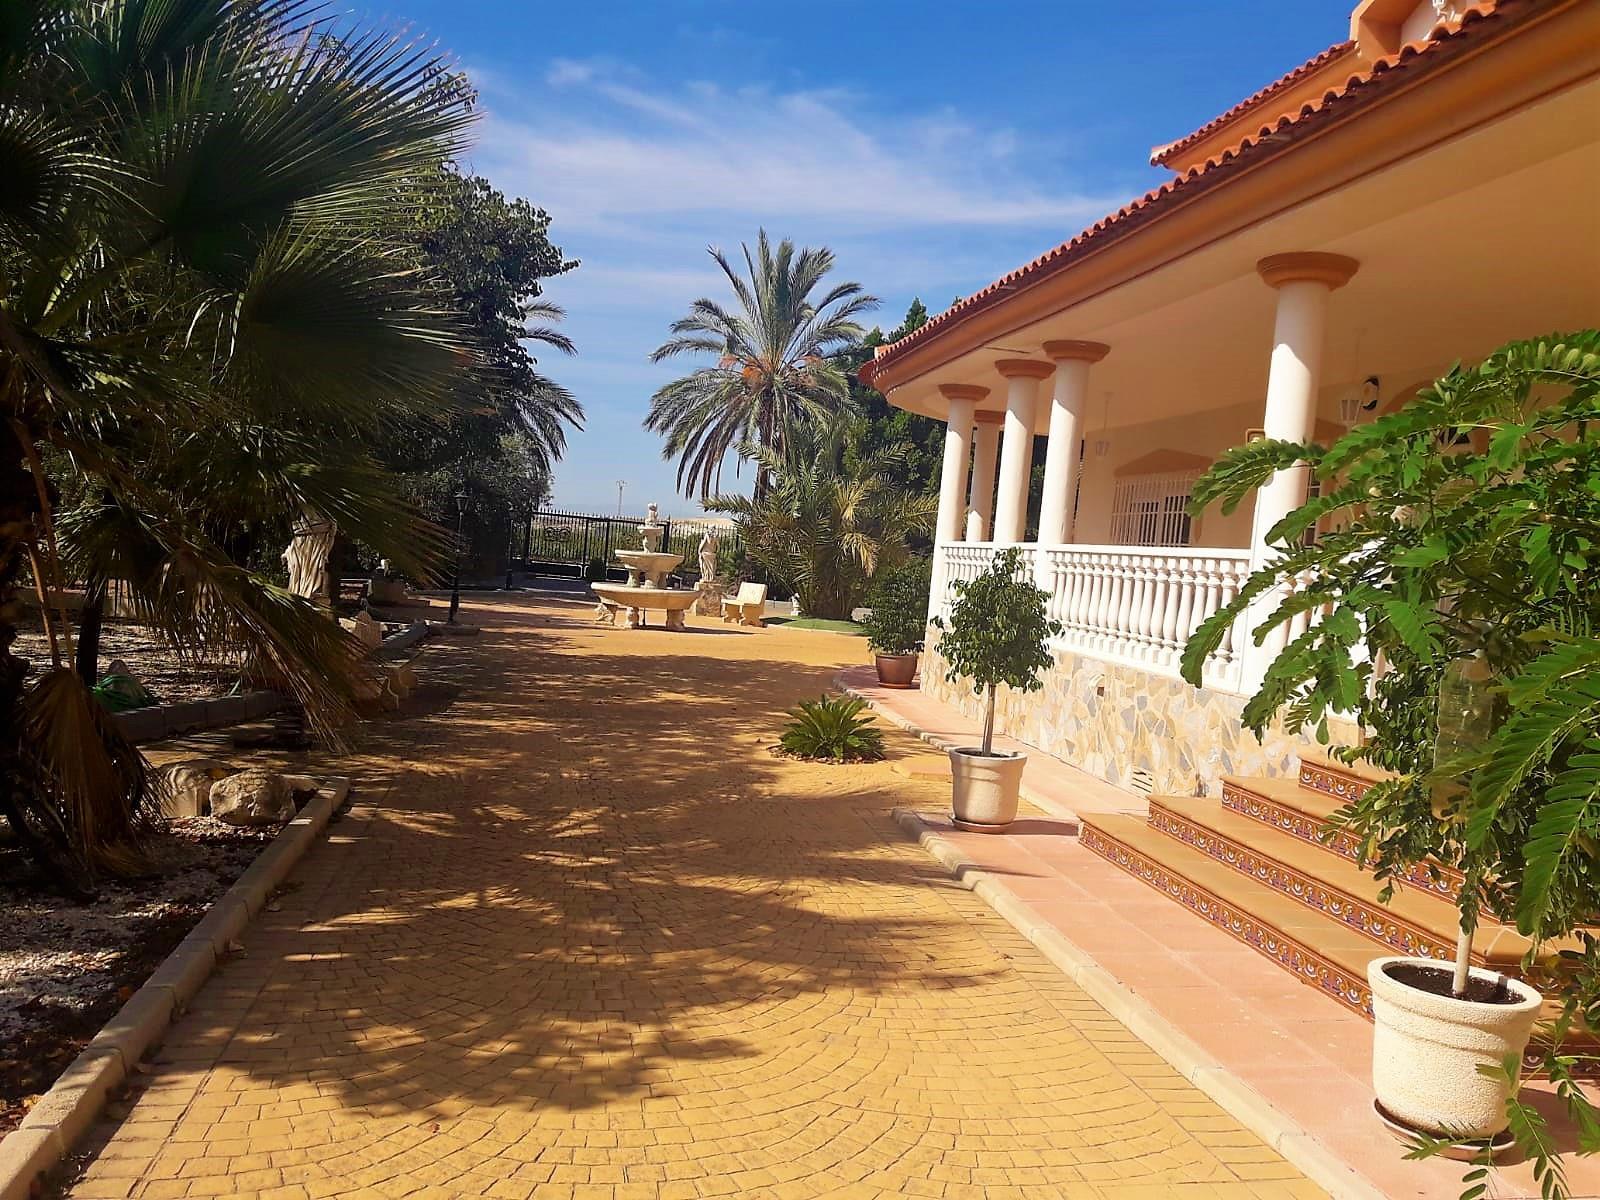 Maison - Murcia - #4134055-3